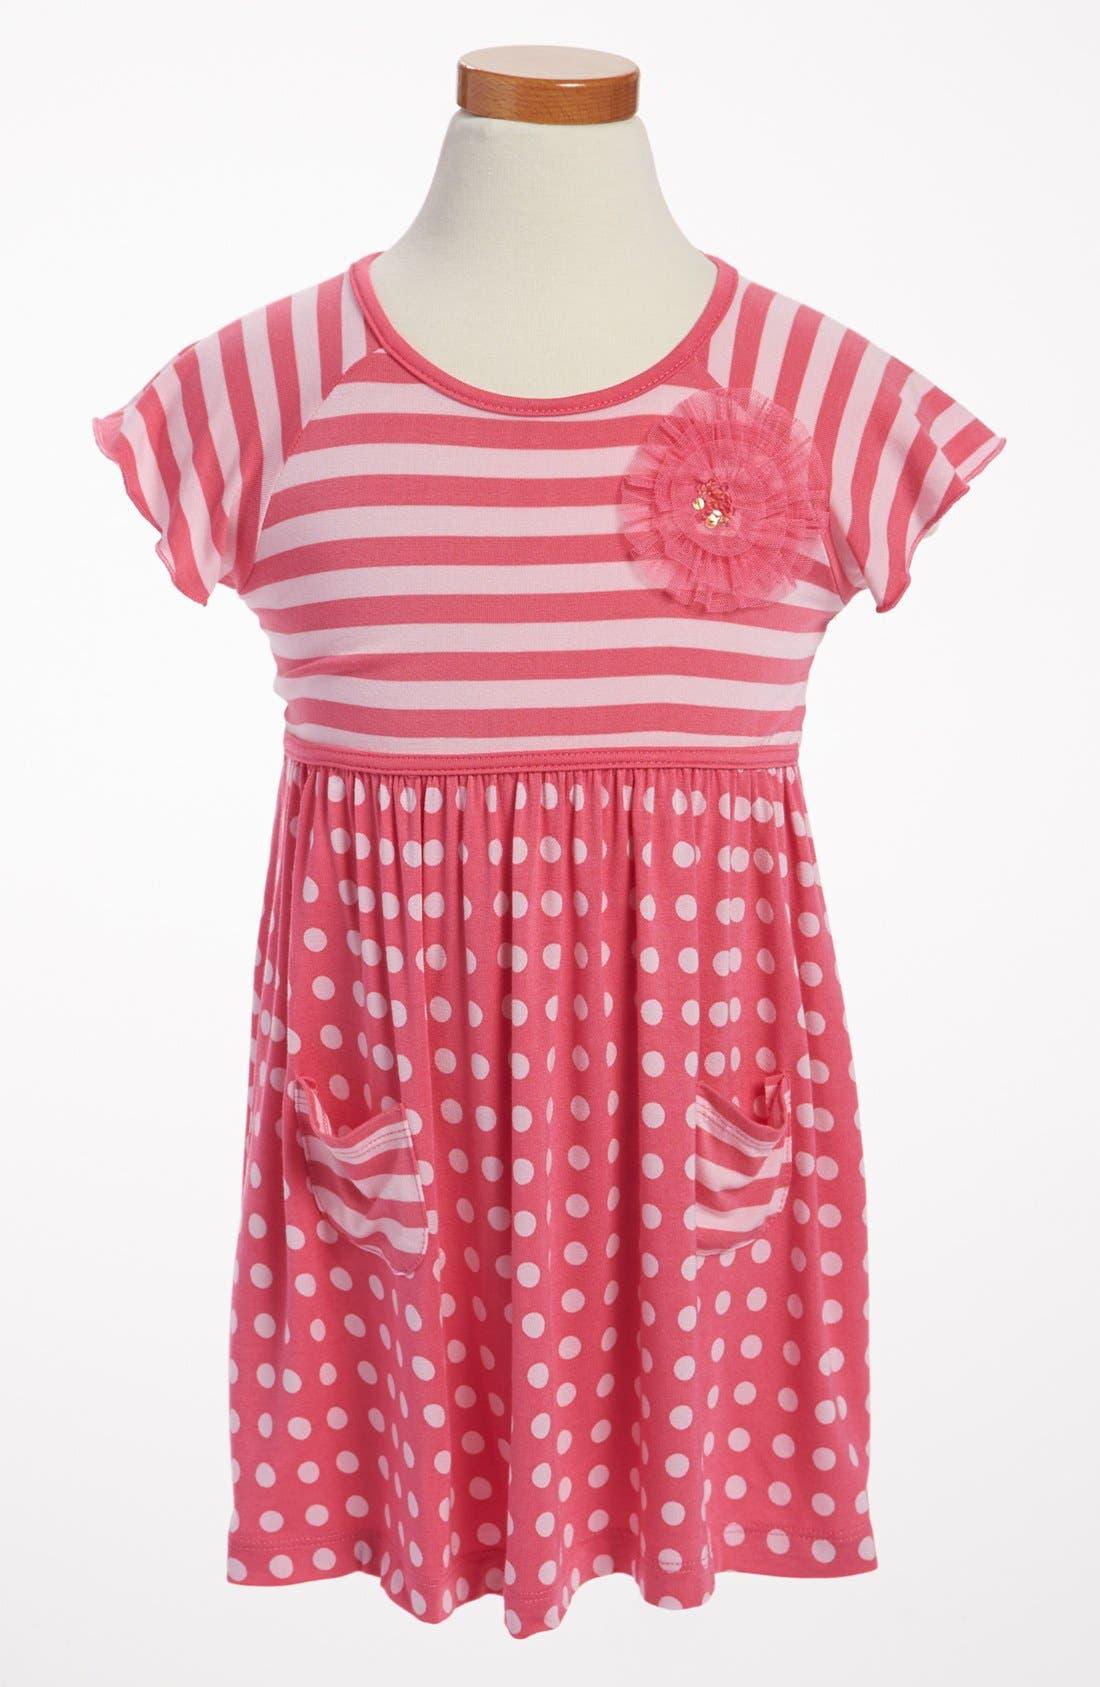 Main Image - Design History Dress (Toddler)